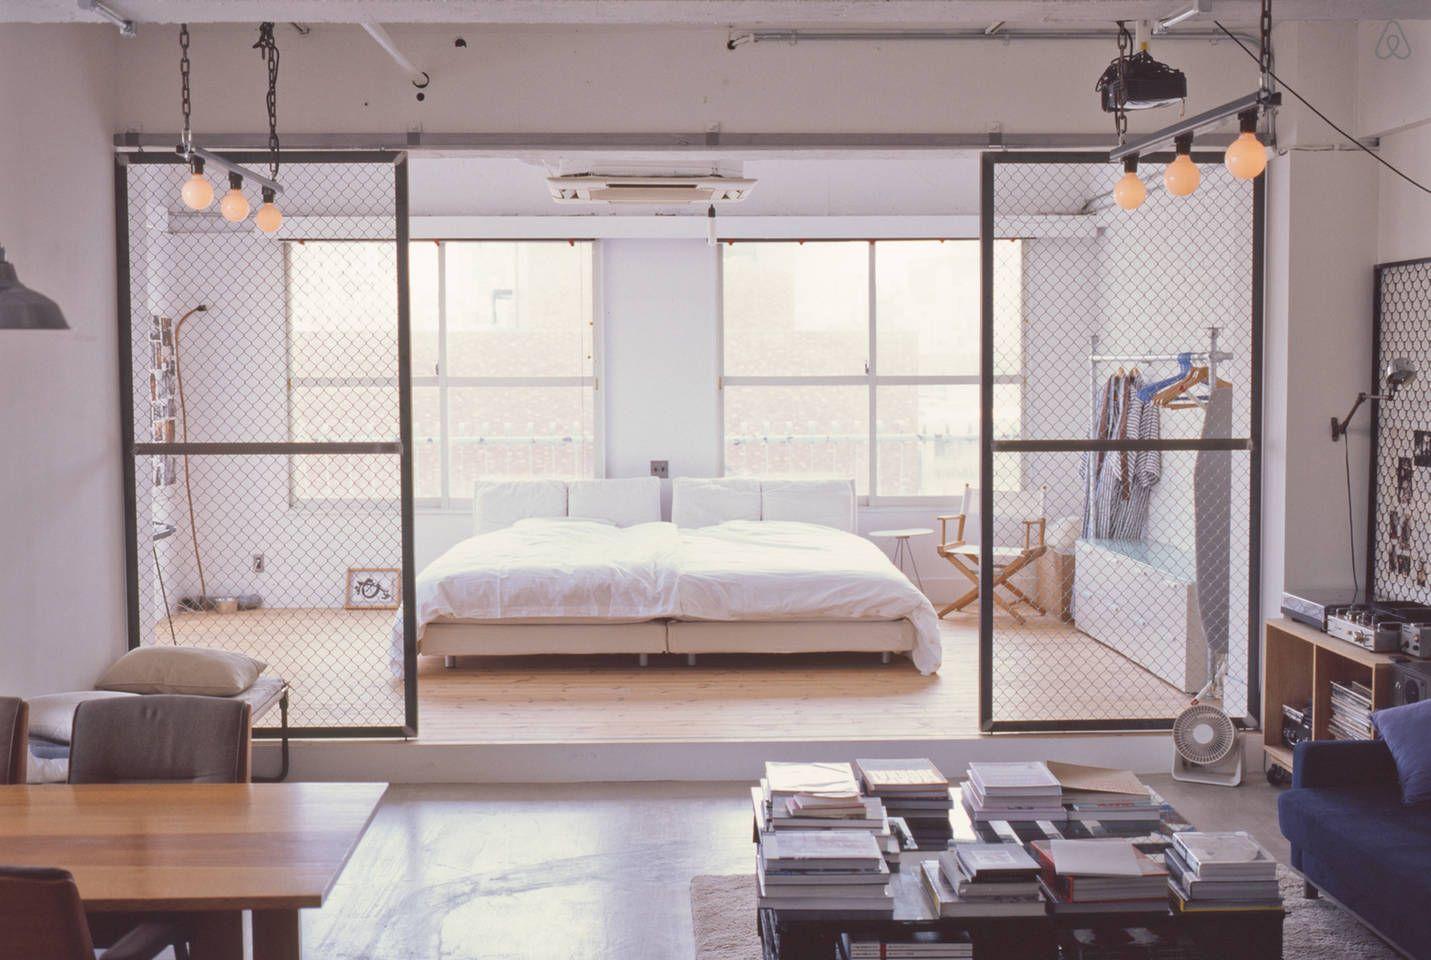 Design Loft next to Tokyo Midtown | Maison | Pinterest | Lofts ...